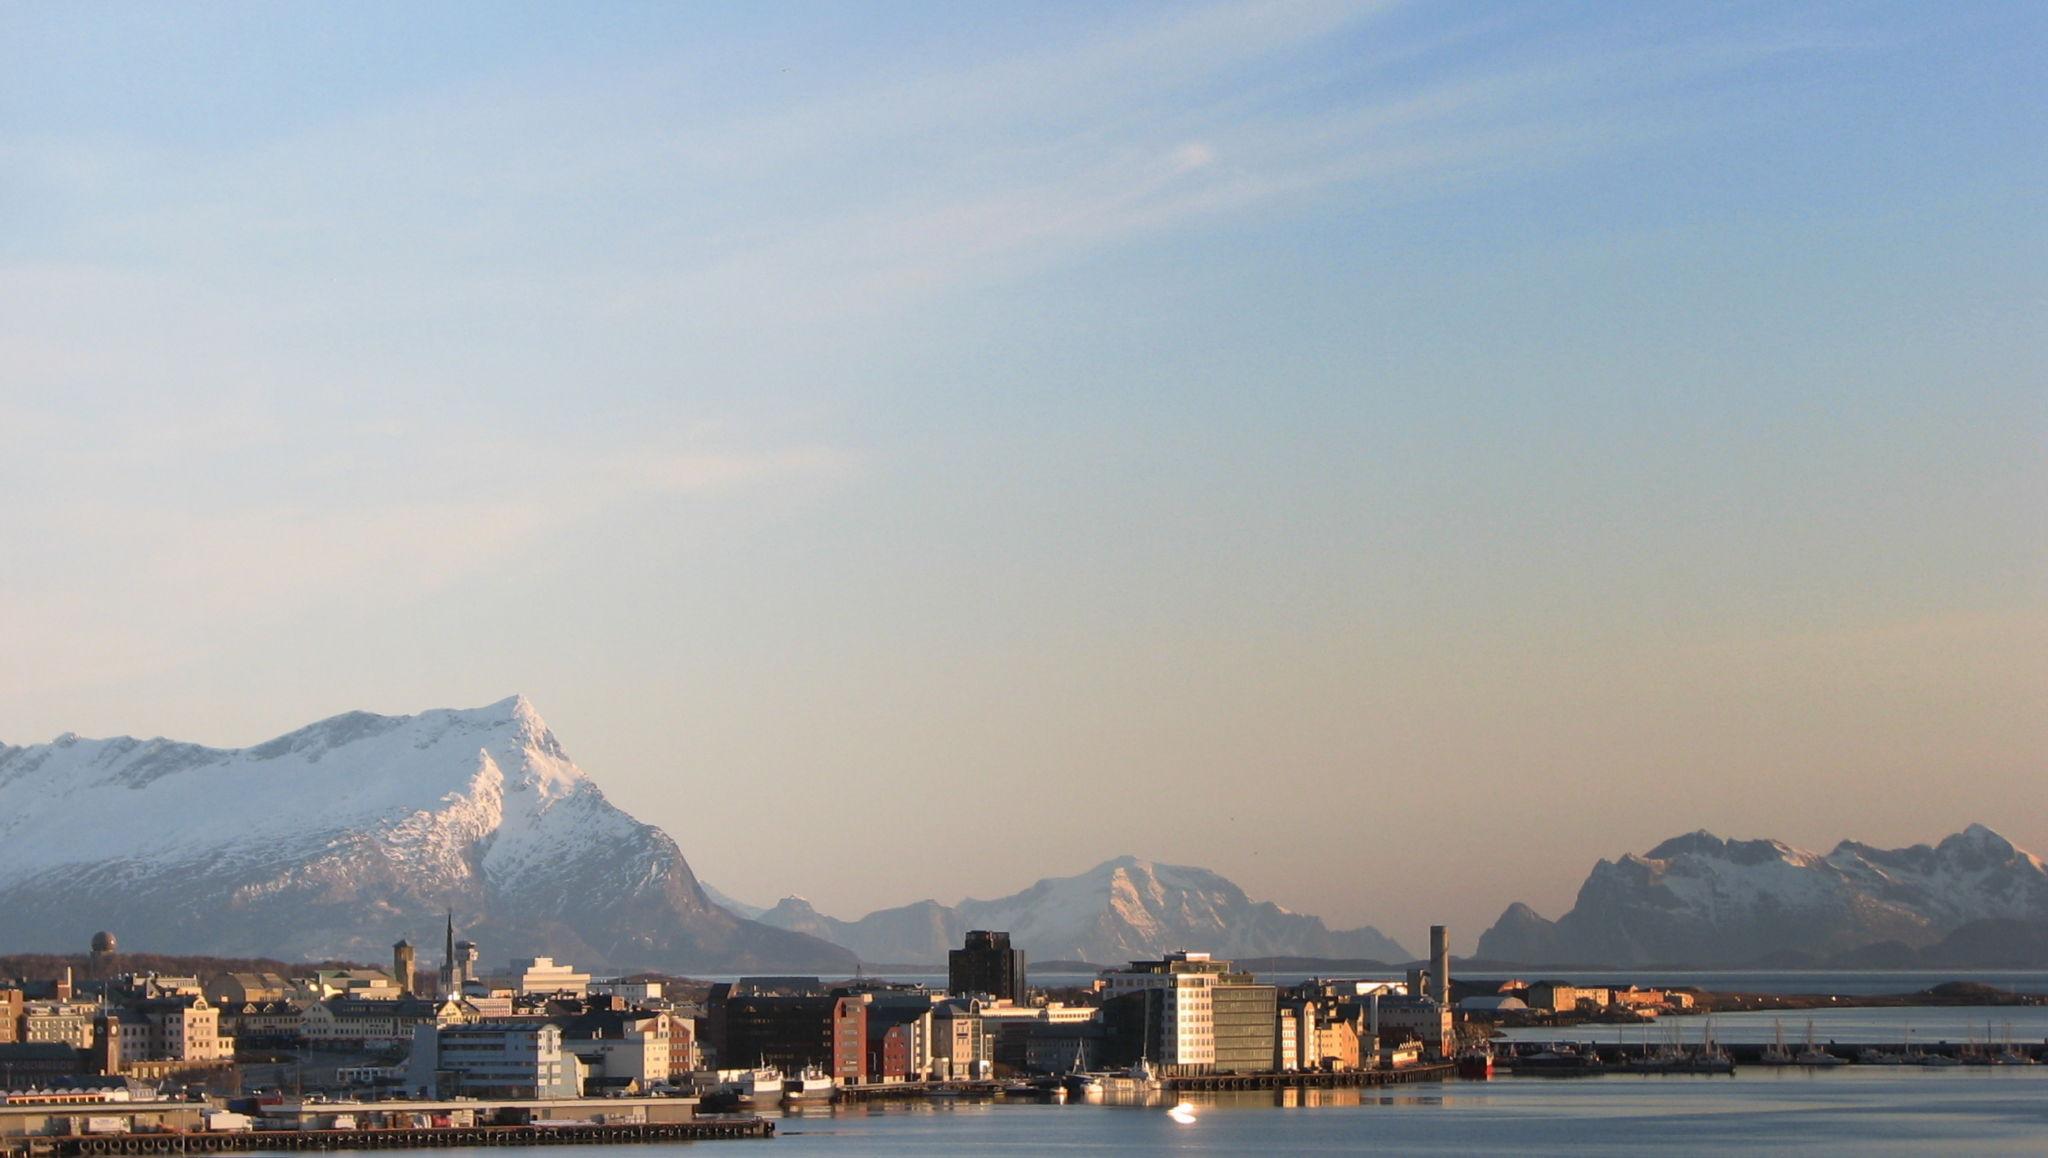 Finn psykolog i Nordland - Psykolog Bodø, Mo i Rana, Narvik, Mosjøen 1